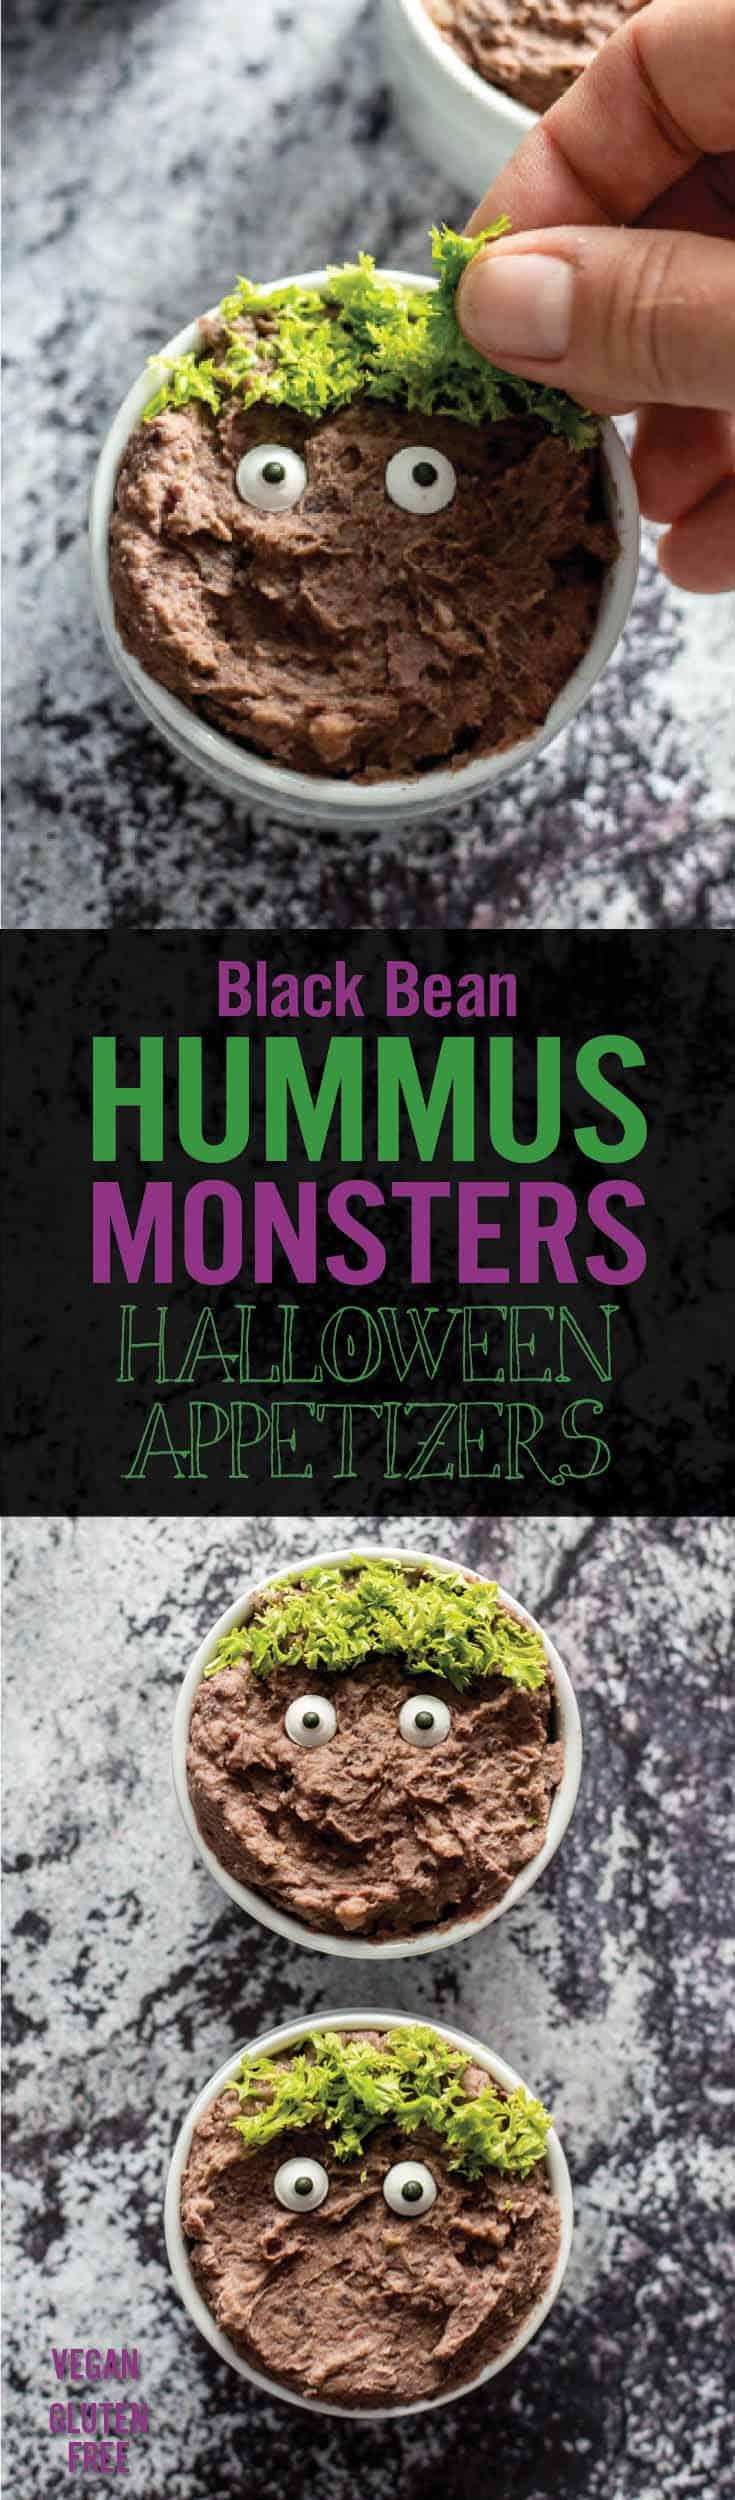 Black Bean Hummus Monster Halloween Appetizers